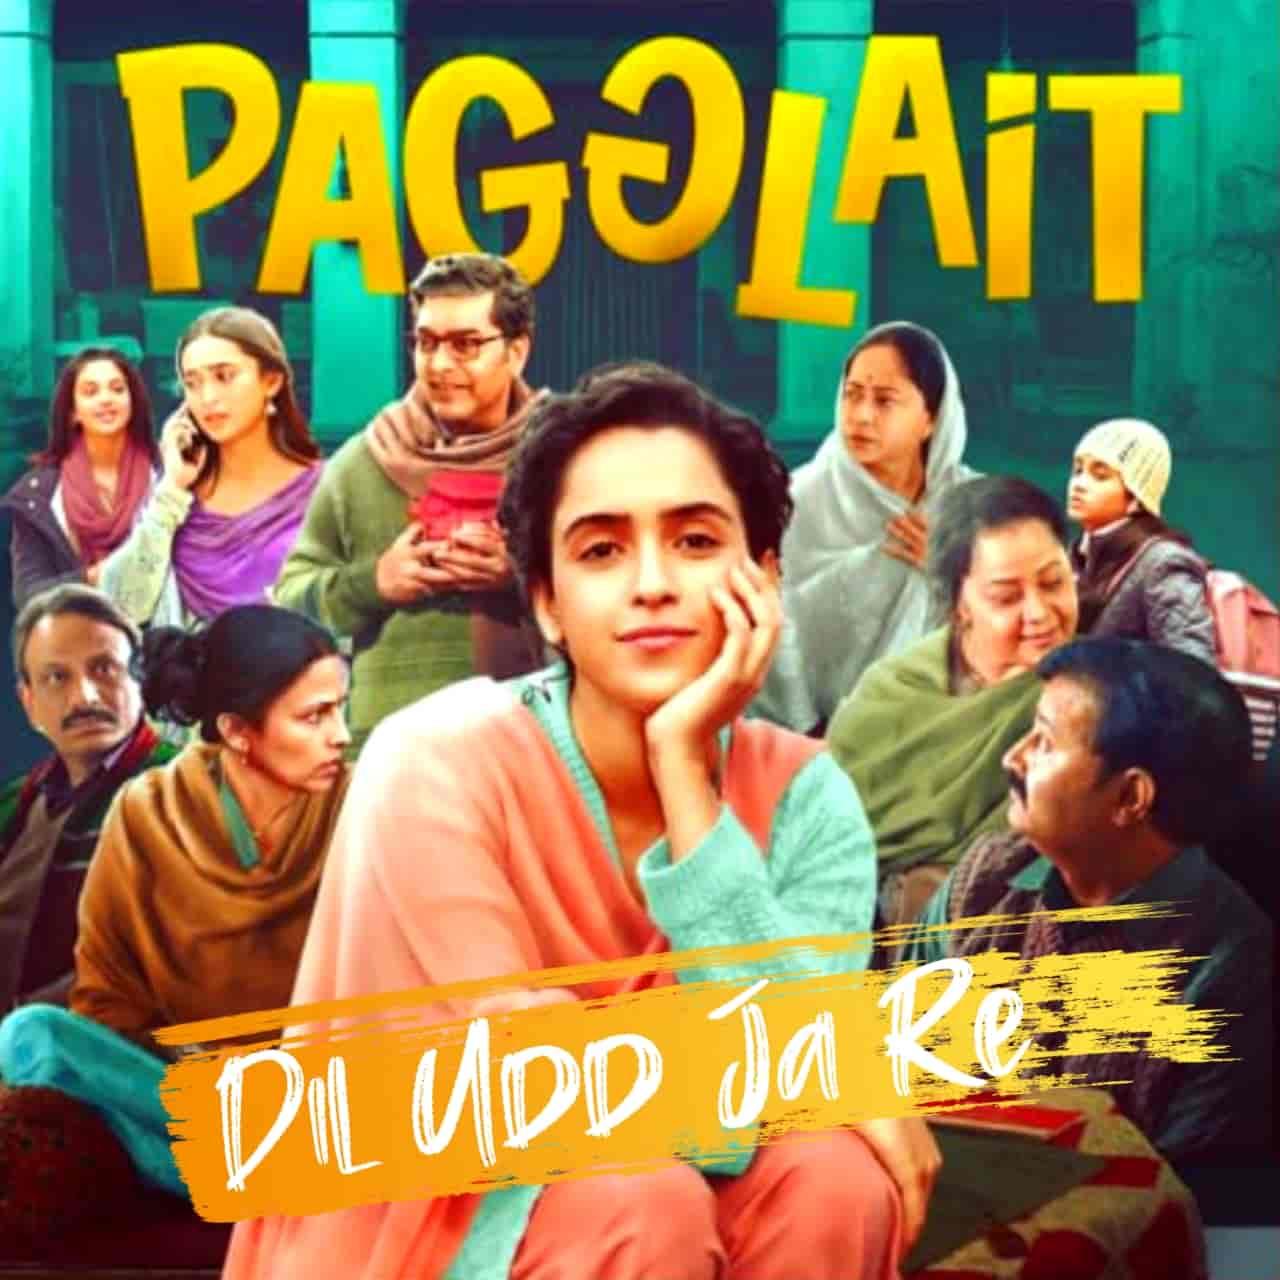 Dil Udd Ja Re Lyrics, Sung by Neeti Mohan.